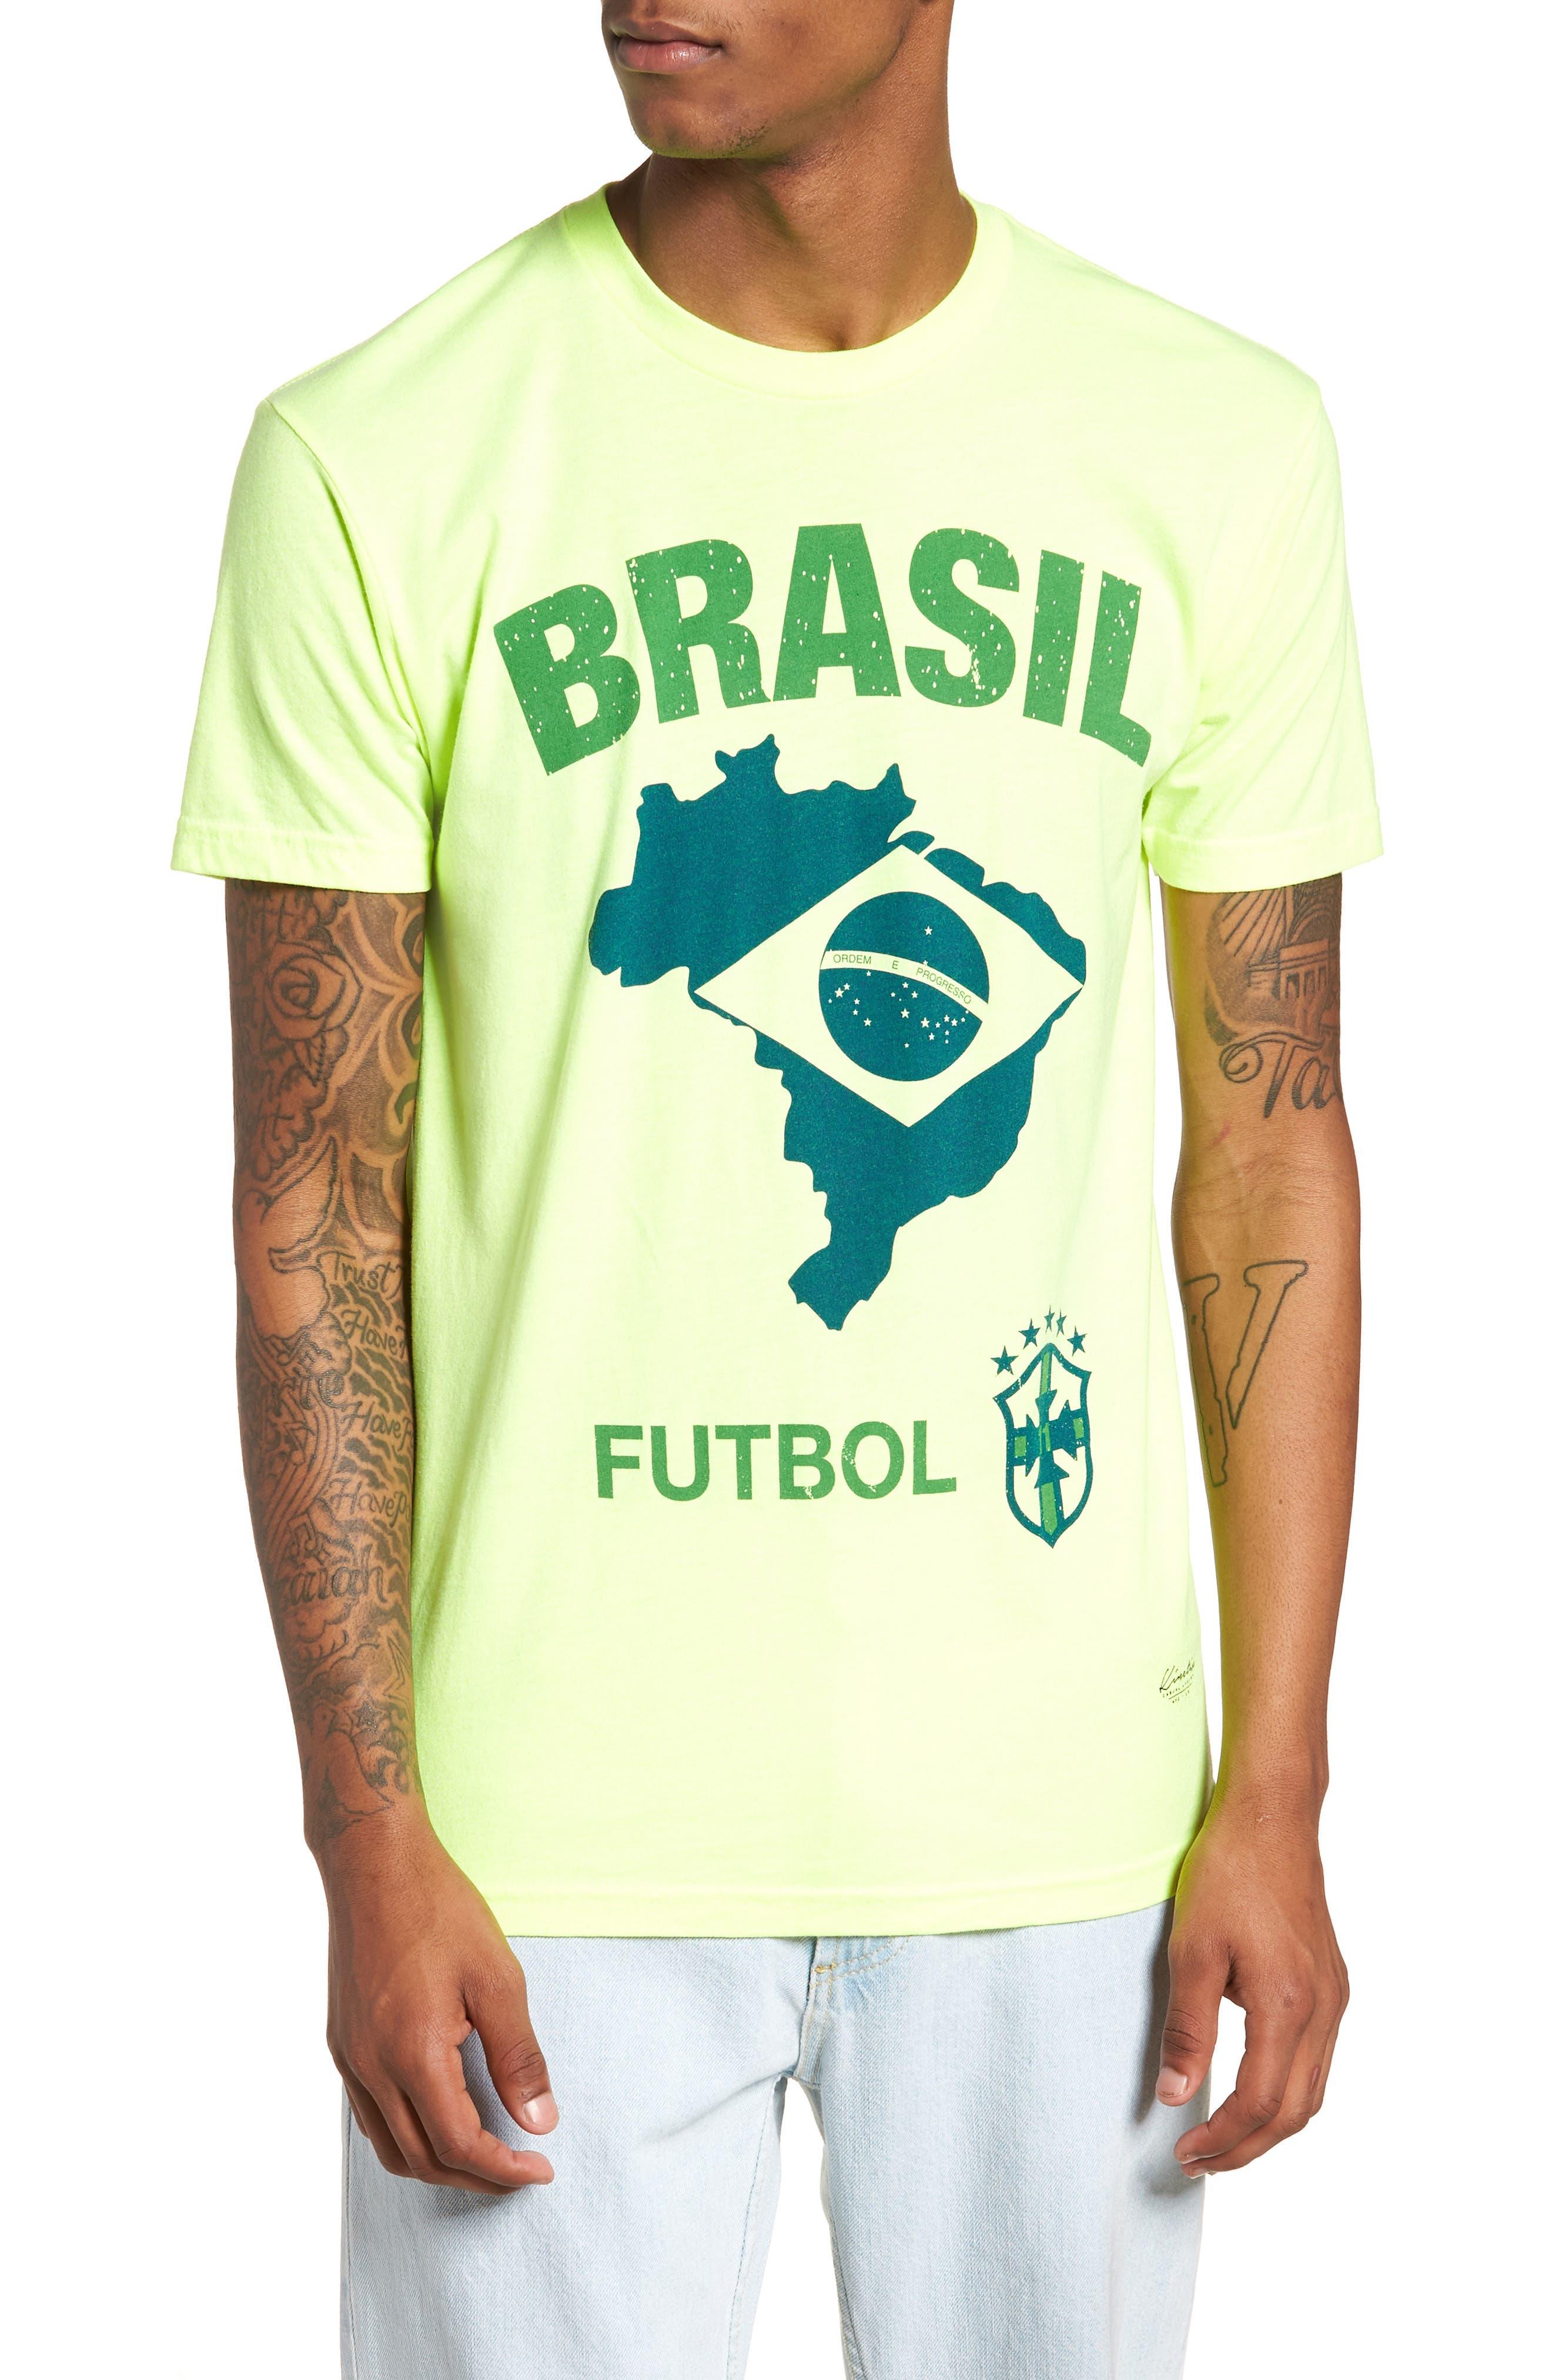 Brasil Futbol T-Shirt,                             Main thumbnail 1, color,                             700